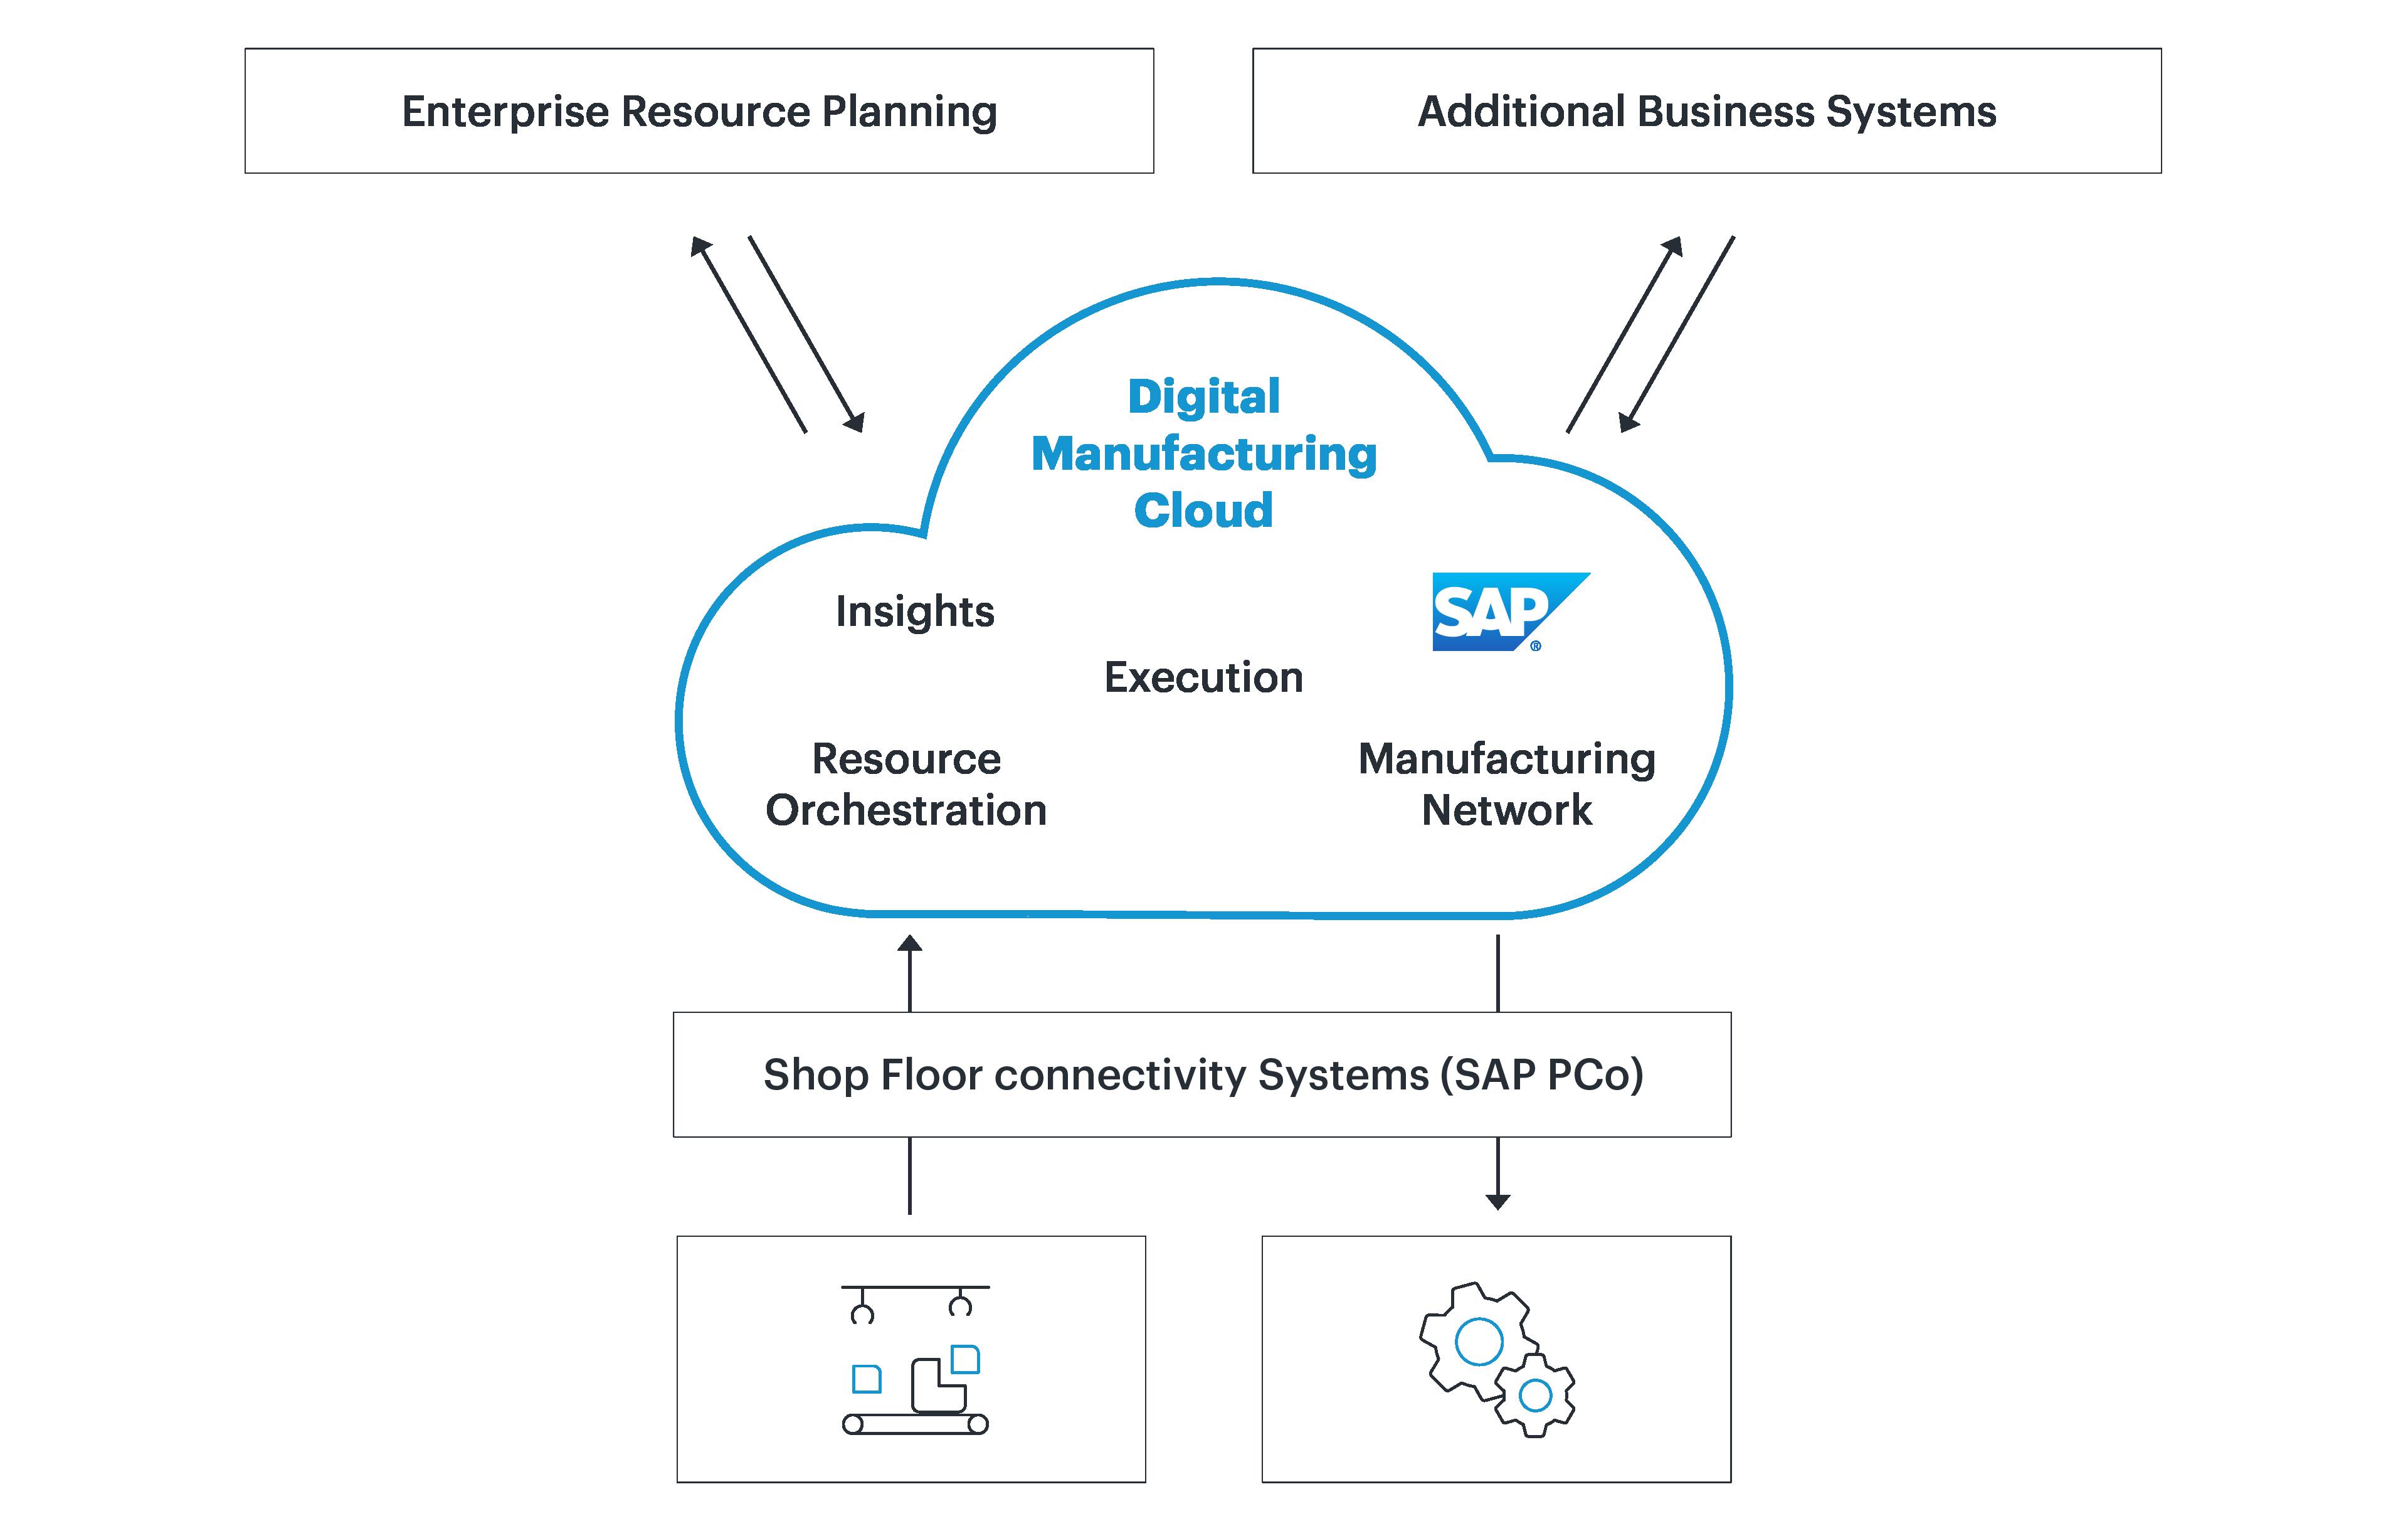 Introducing DMC - Digital Manufacturing Cloud